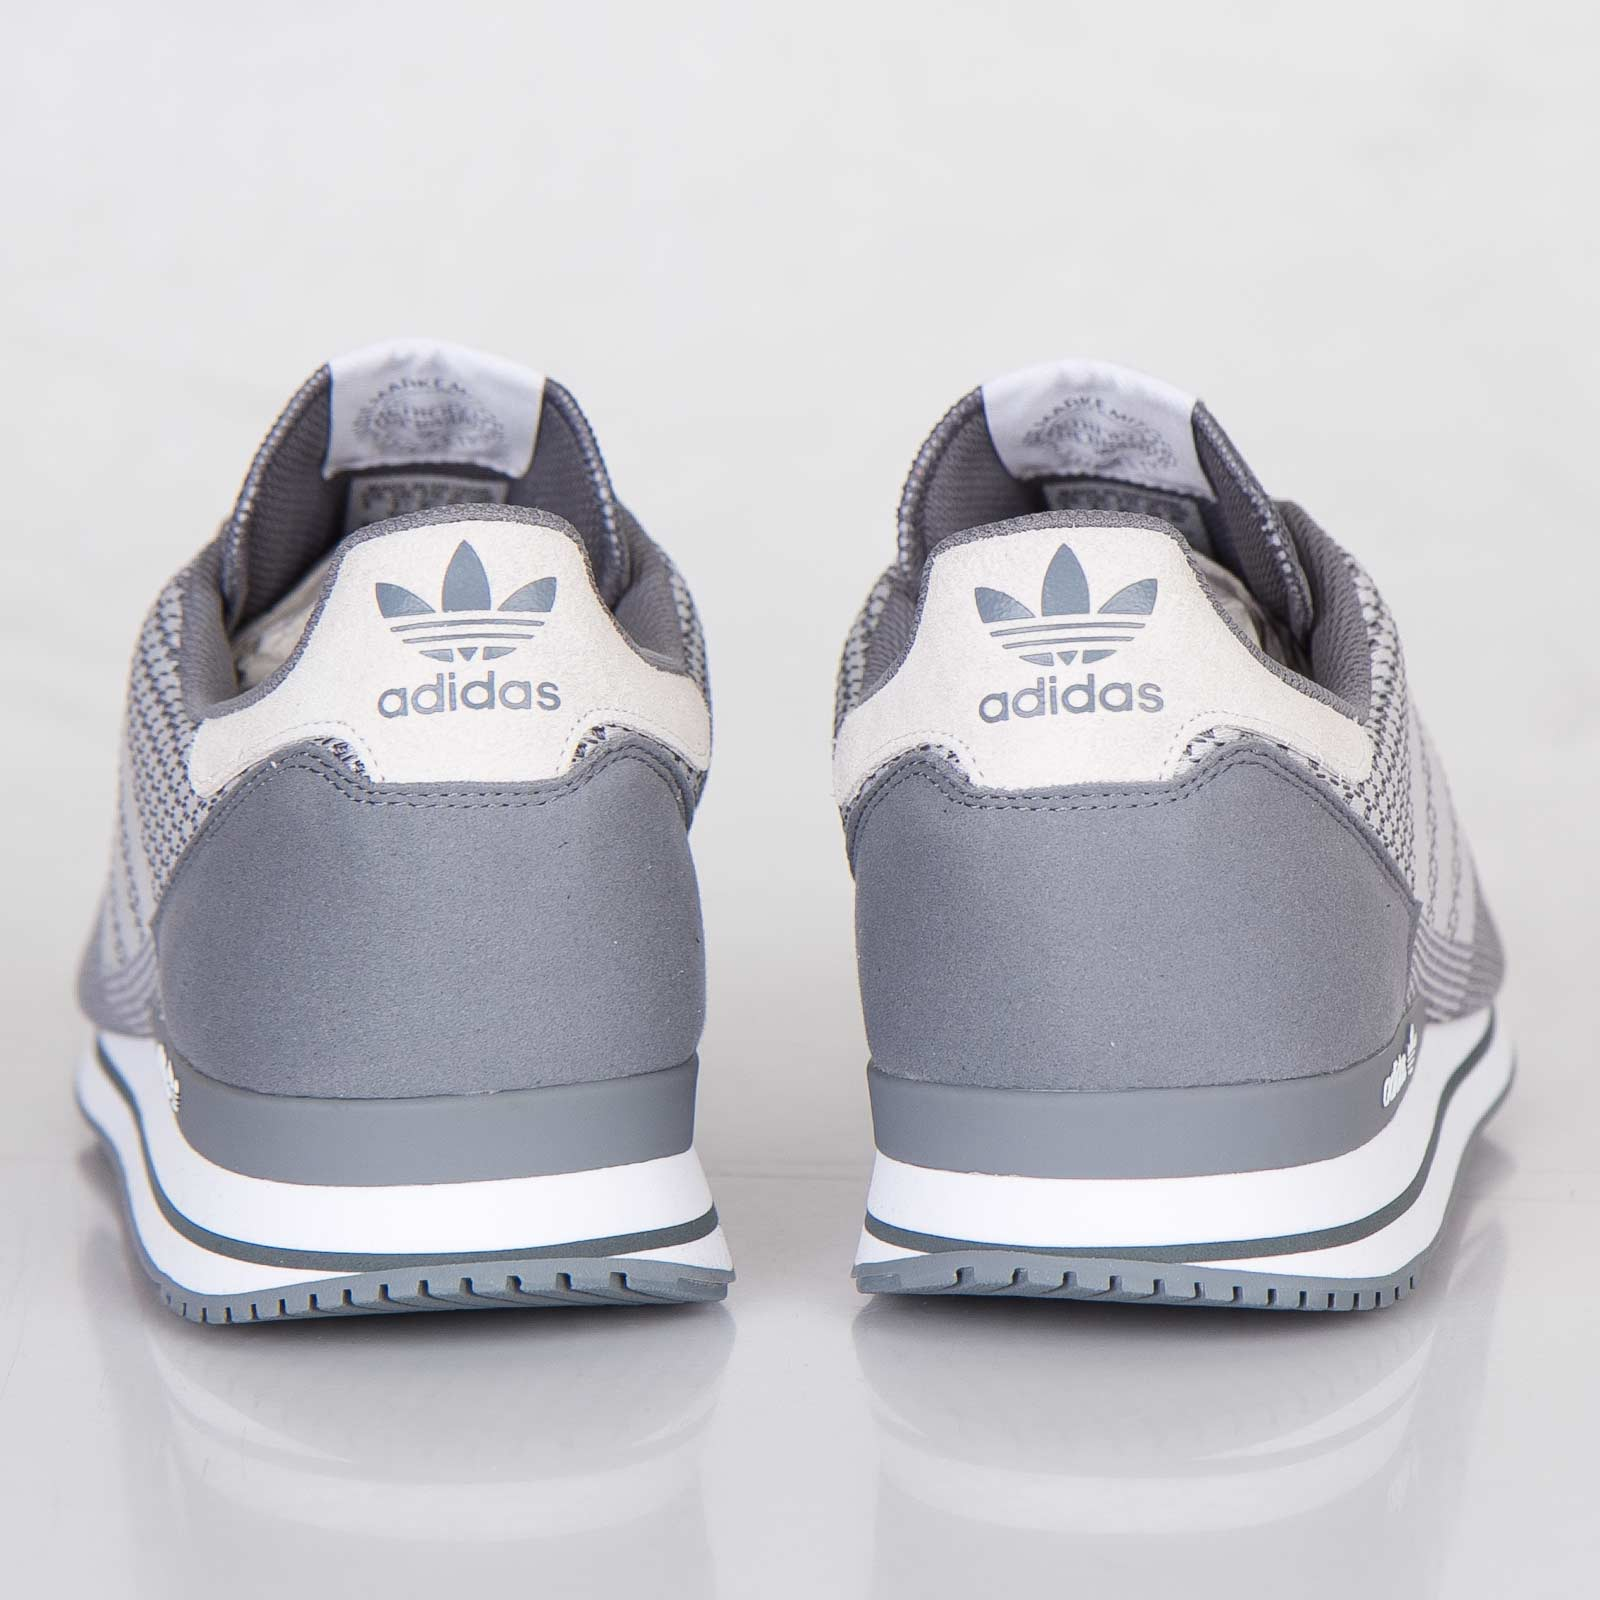 27c4cbf682040 adidas ZX 500 OG Weave - M20995 - Sneakersnstuff